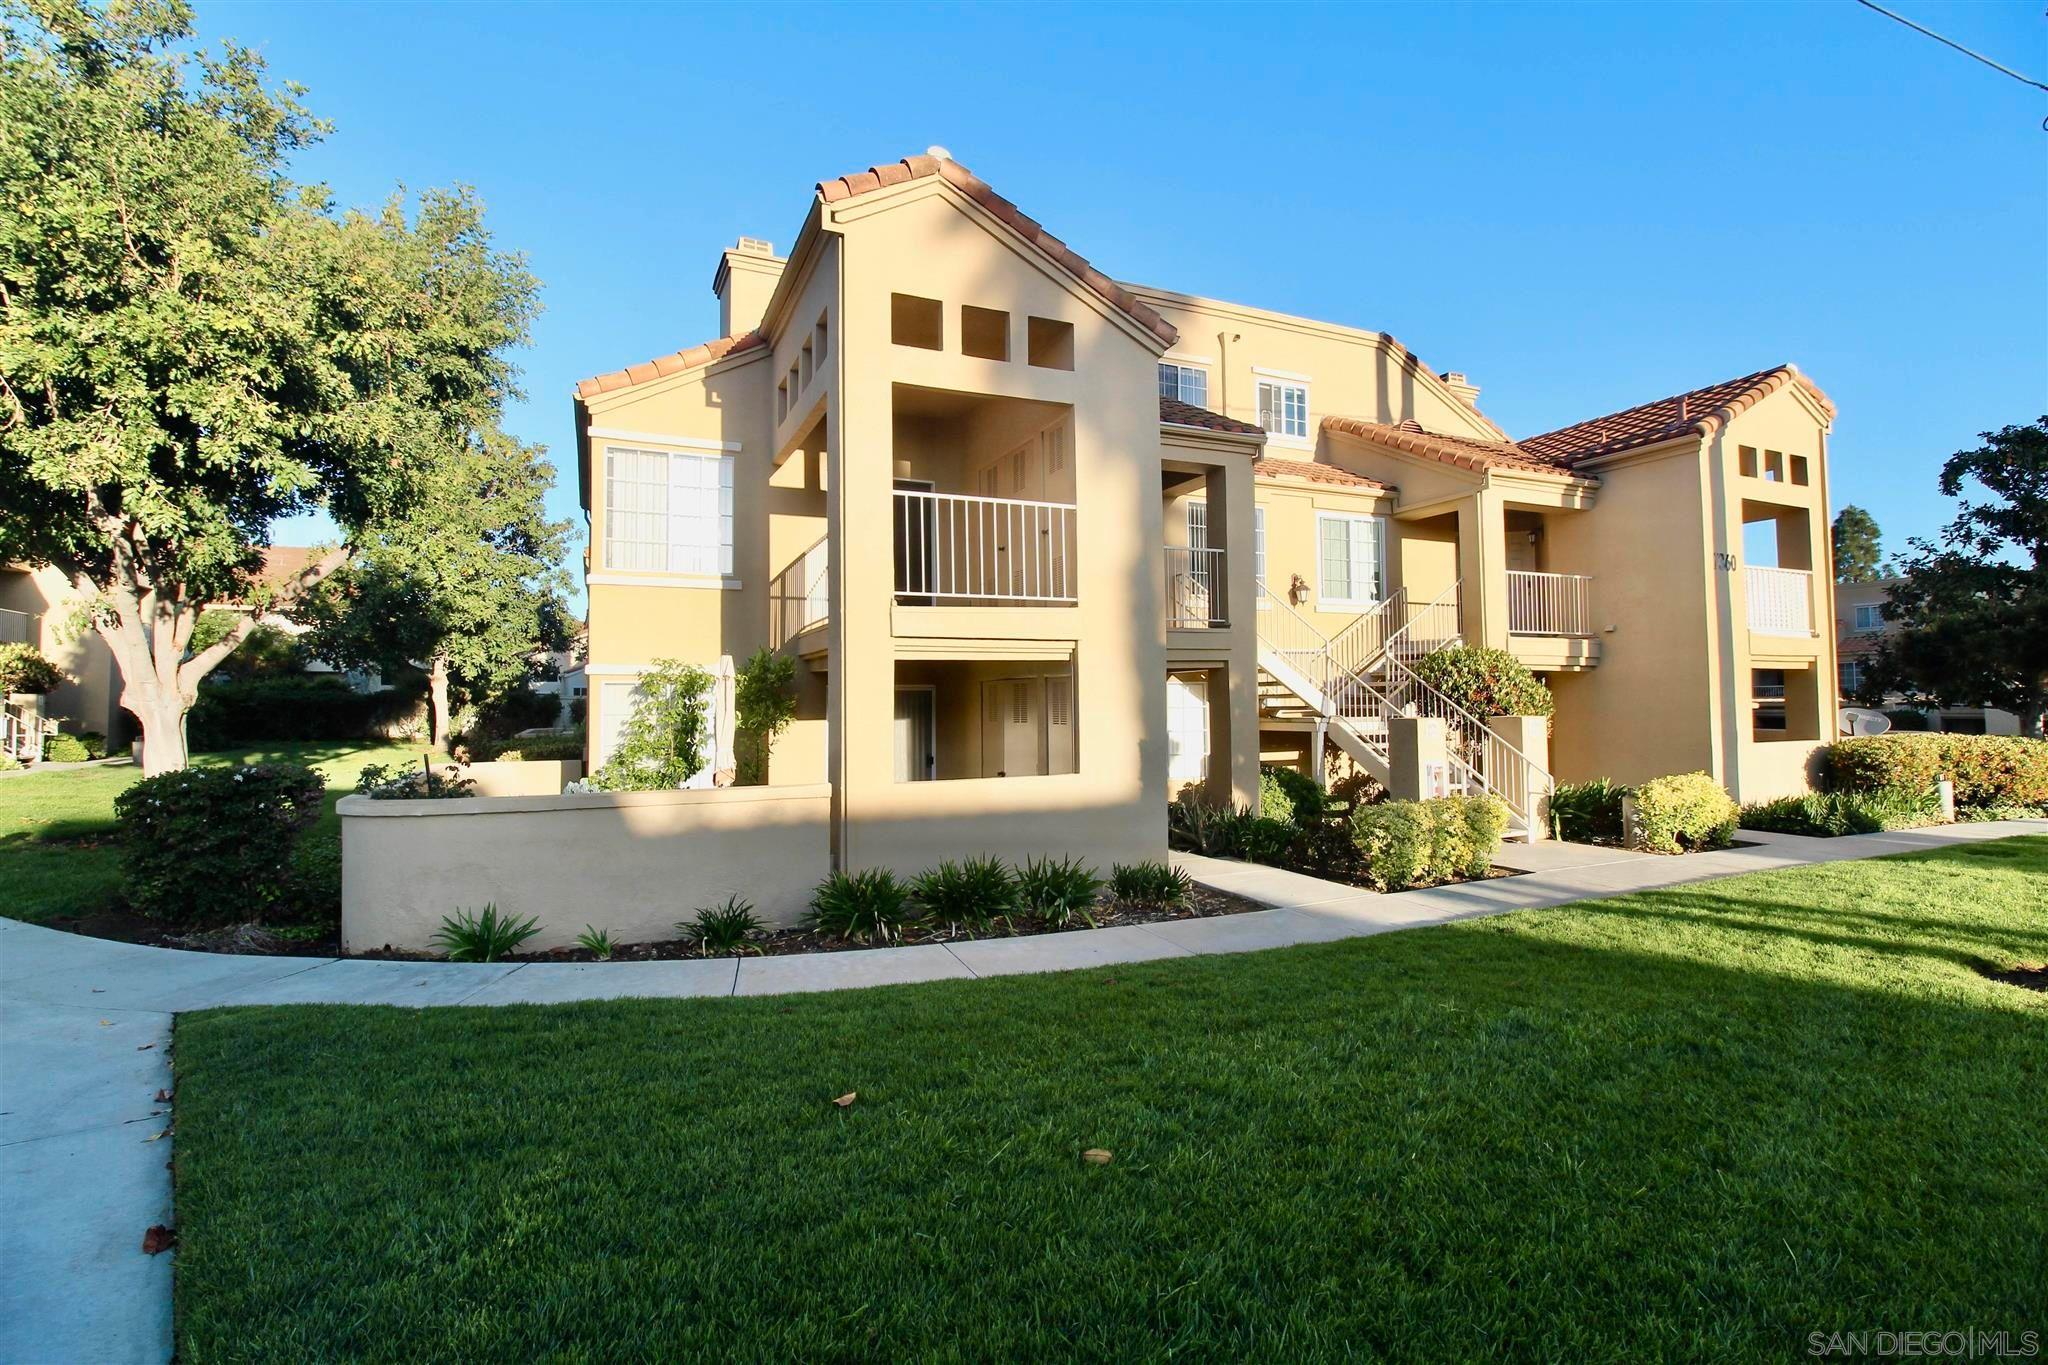 Main Photo: MIRA MESA Condo for sale : 2 bedrooms : 7360 Calle Cristobal #106 in San Diego